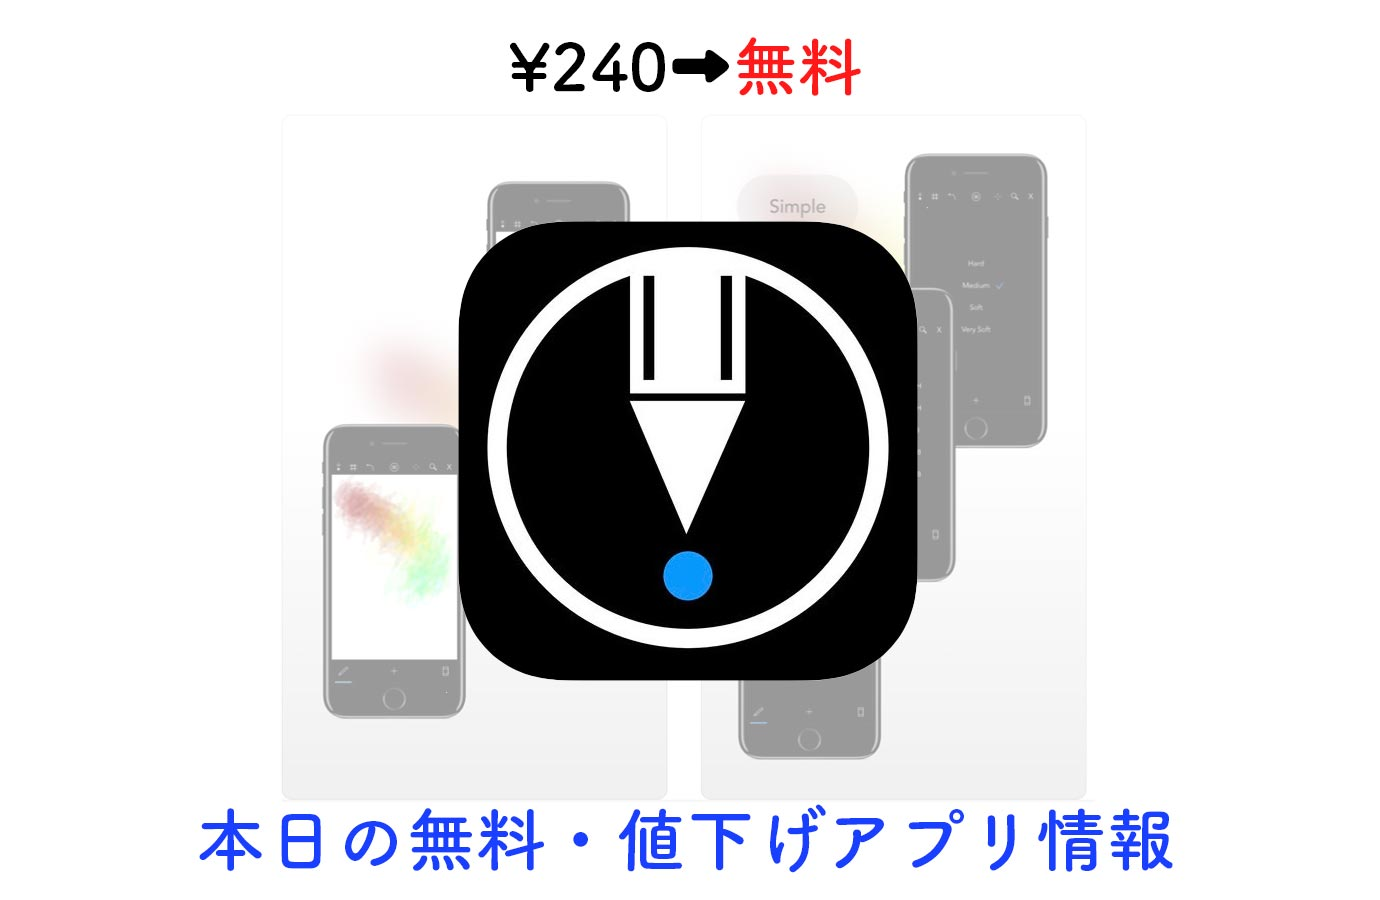 Appsale0528